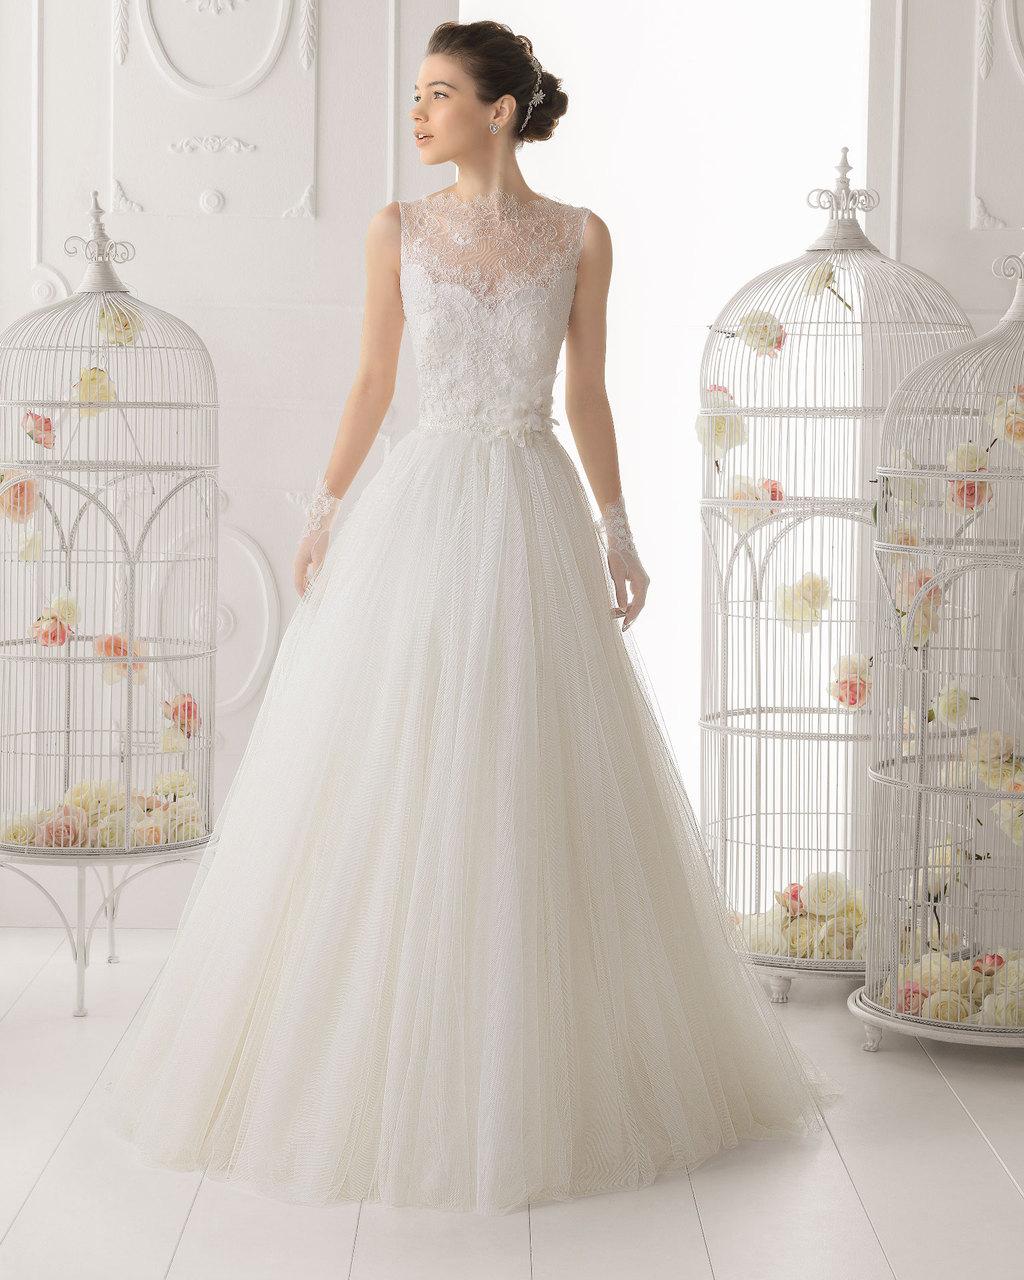 Aire-barcelona-wedding-dress-2014-bridal-ocarina.full